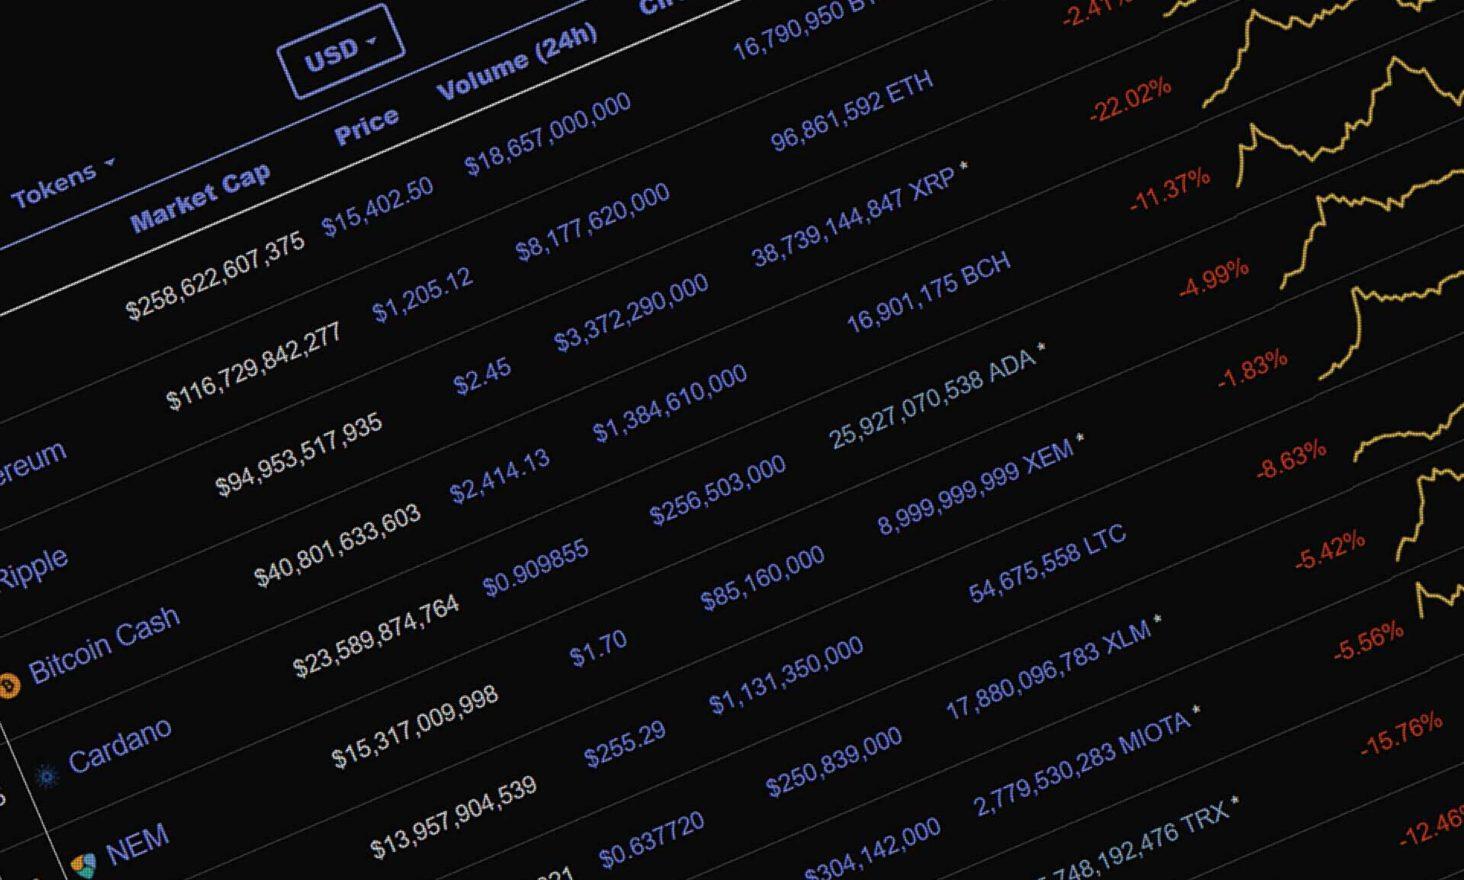 CoinMarketCap Cuts South Korean Exchanges Without Warning, Panic Selling Ensues